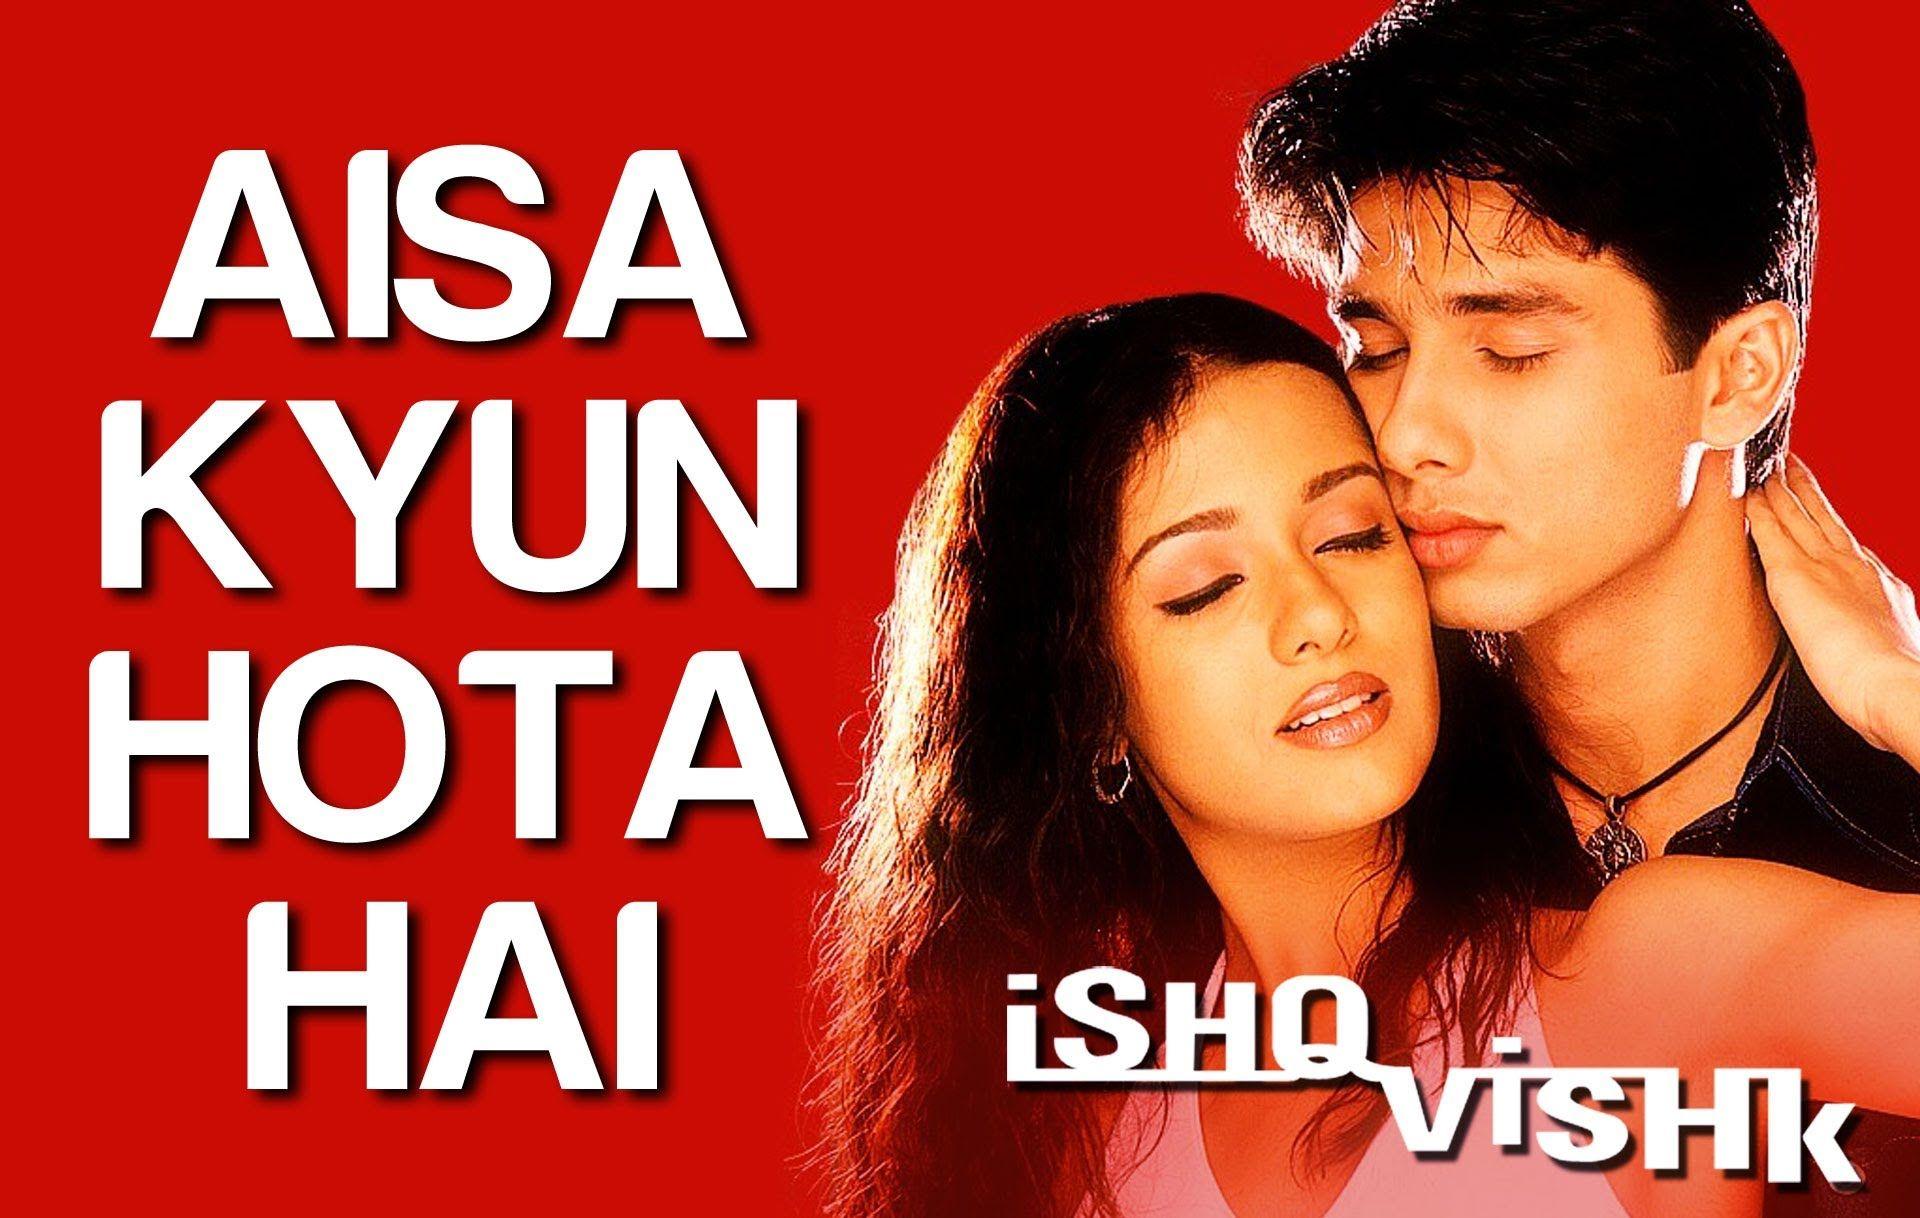 Aisa Kyun Hota Hai Ishq Vishk Amrita Rao Alka Yagnik Anu Malik Latest Bollywood Songs Hindi Movie Song Saddest Songs